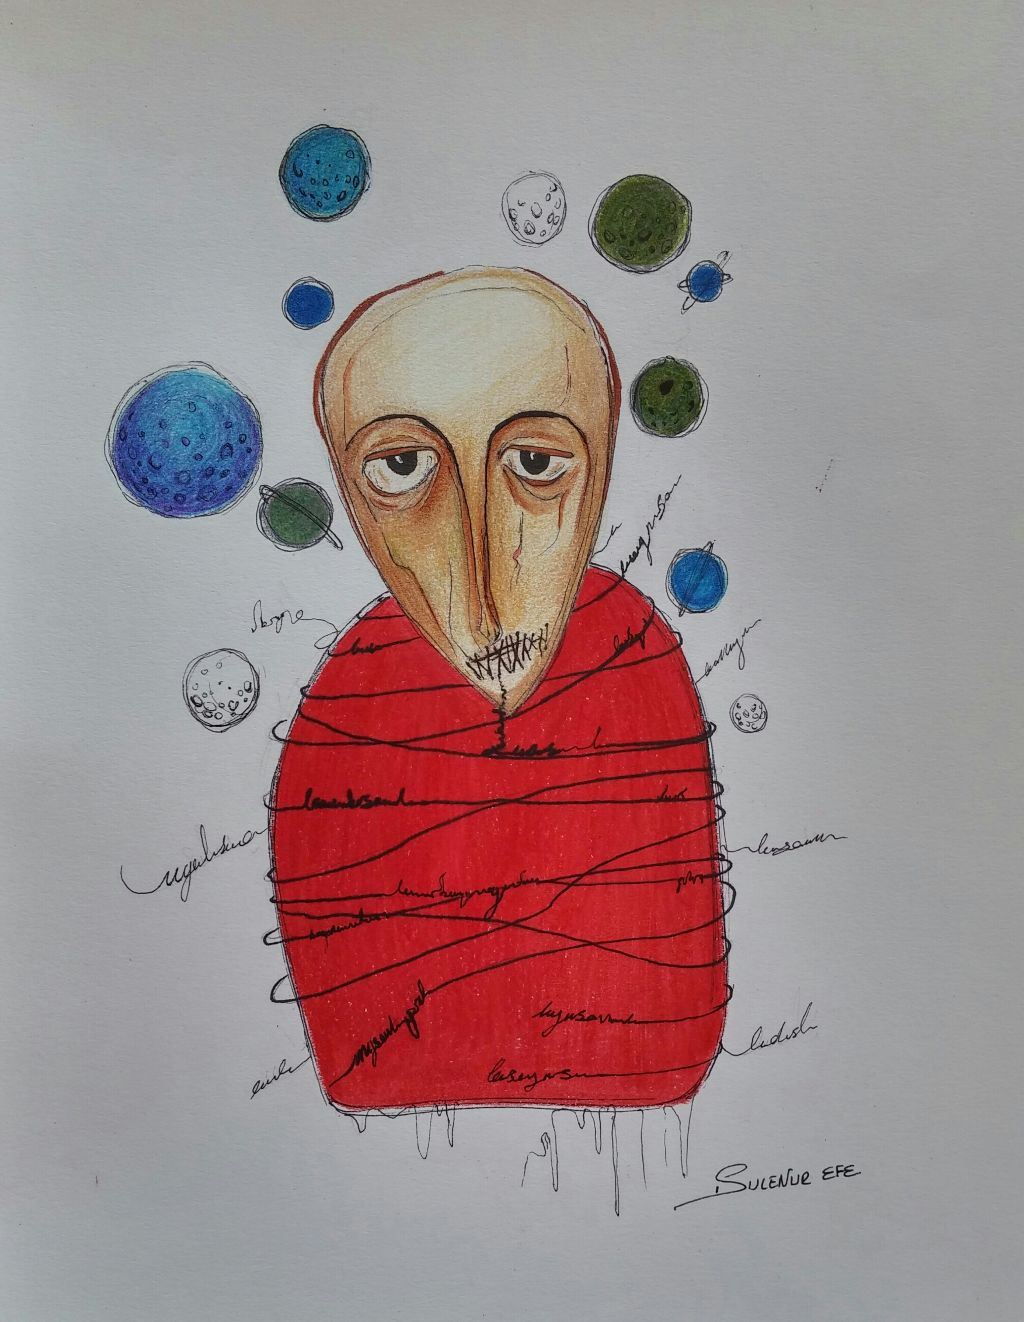 #colorful #illustration #illust #illustrator #insdraw  #design  #draw #drawing #designer #drawoftheday #drawingoftheday #drawings #dergi  #mywork #art #artwork #artist #arte #creativework #painting #paint #eskiz #sketchbook #sketching  #sanat #sketchday